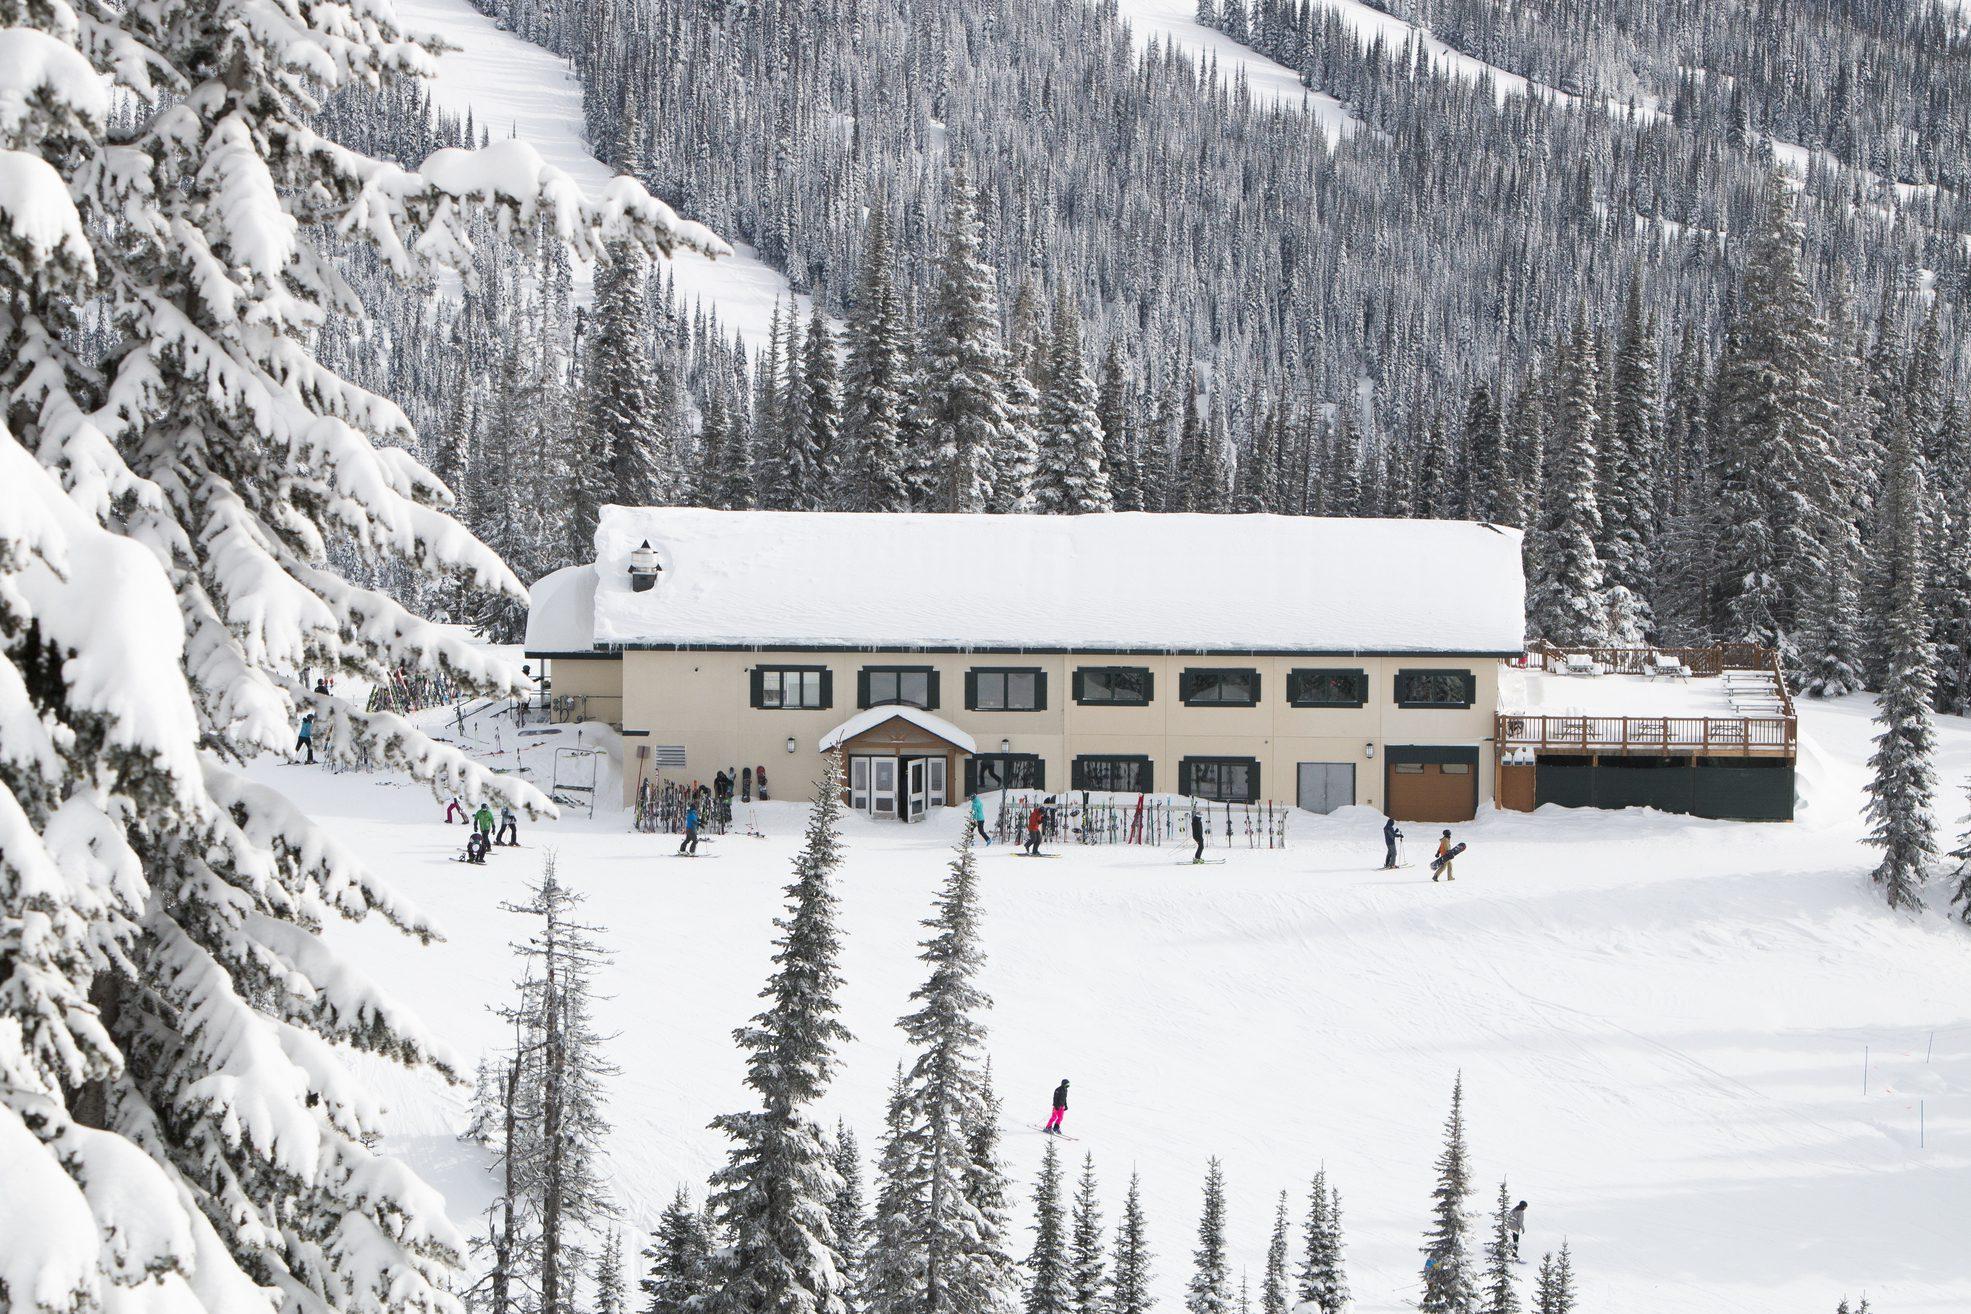 Normerica Timber Frames, Commercial Project, Sun Peaks Resort, Mid Mountrain Lodge, Ski Resort, Sun Peaks, British Columbia, Exterior